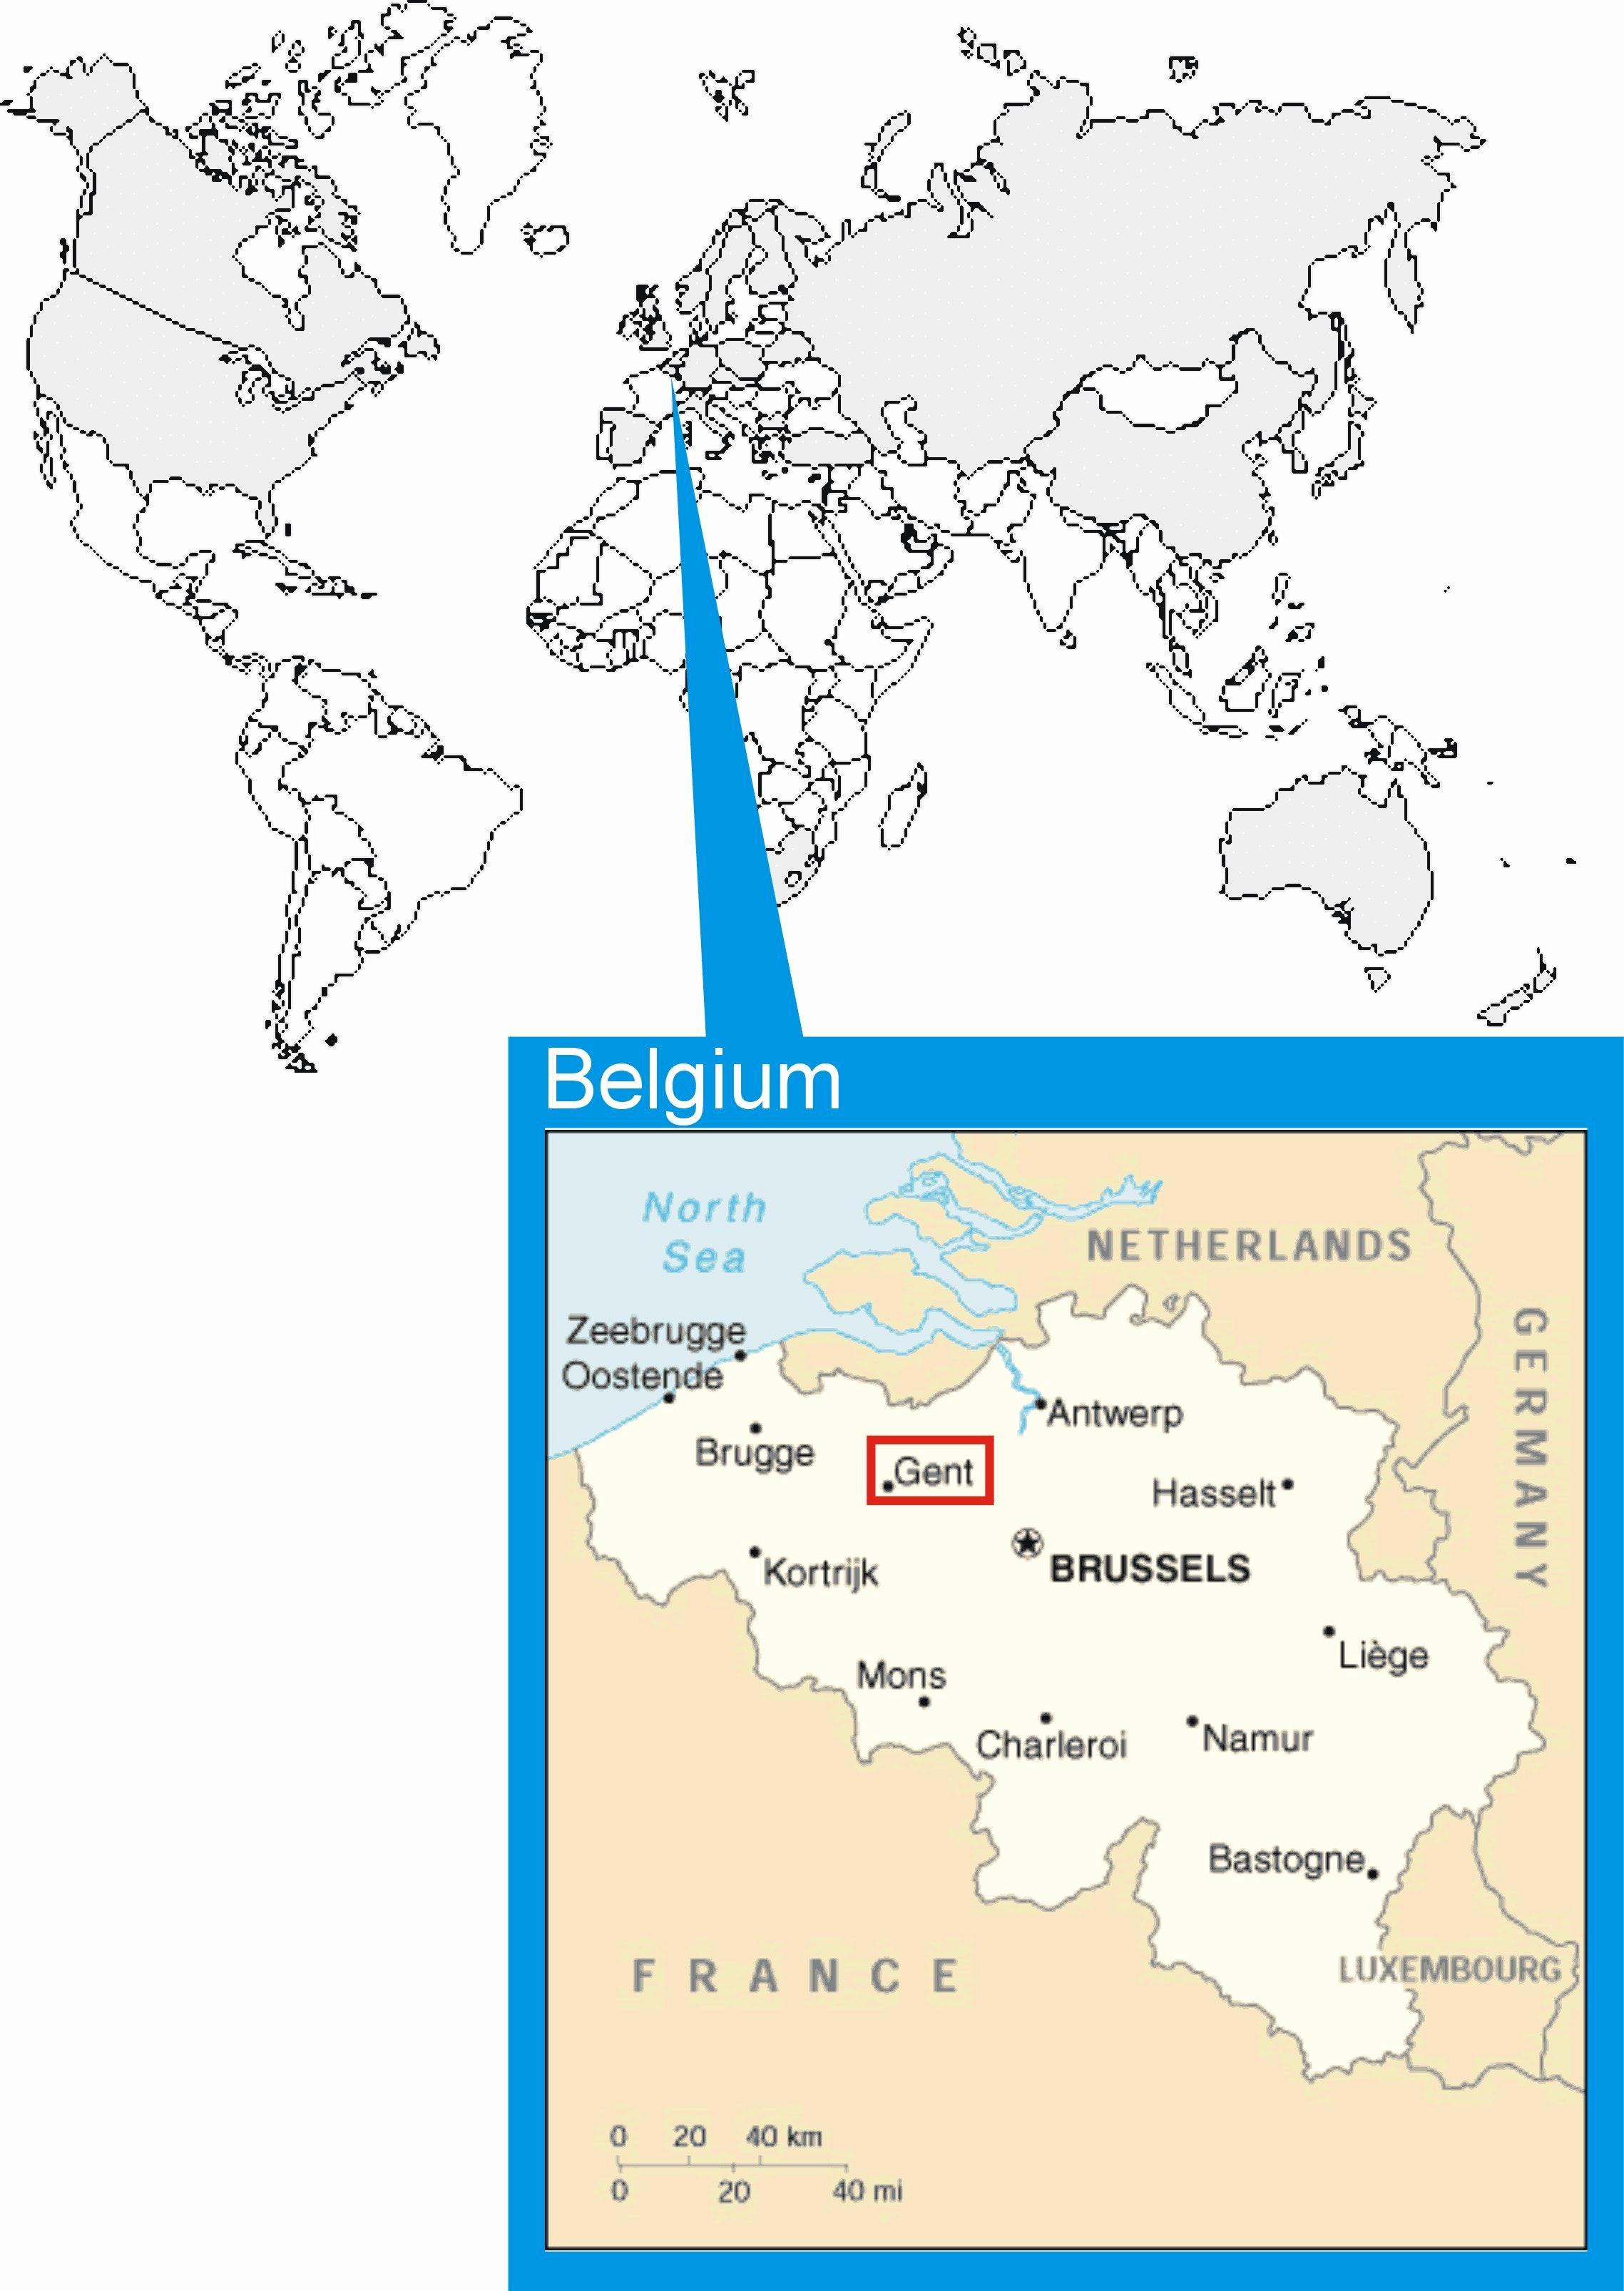 Maailman Kartta Bryssel Bryssel Kartta Maailman Belgia